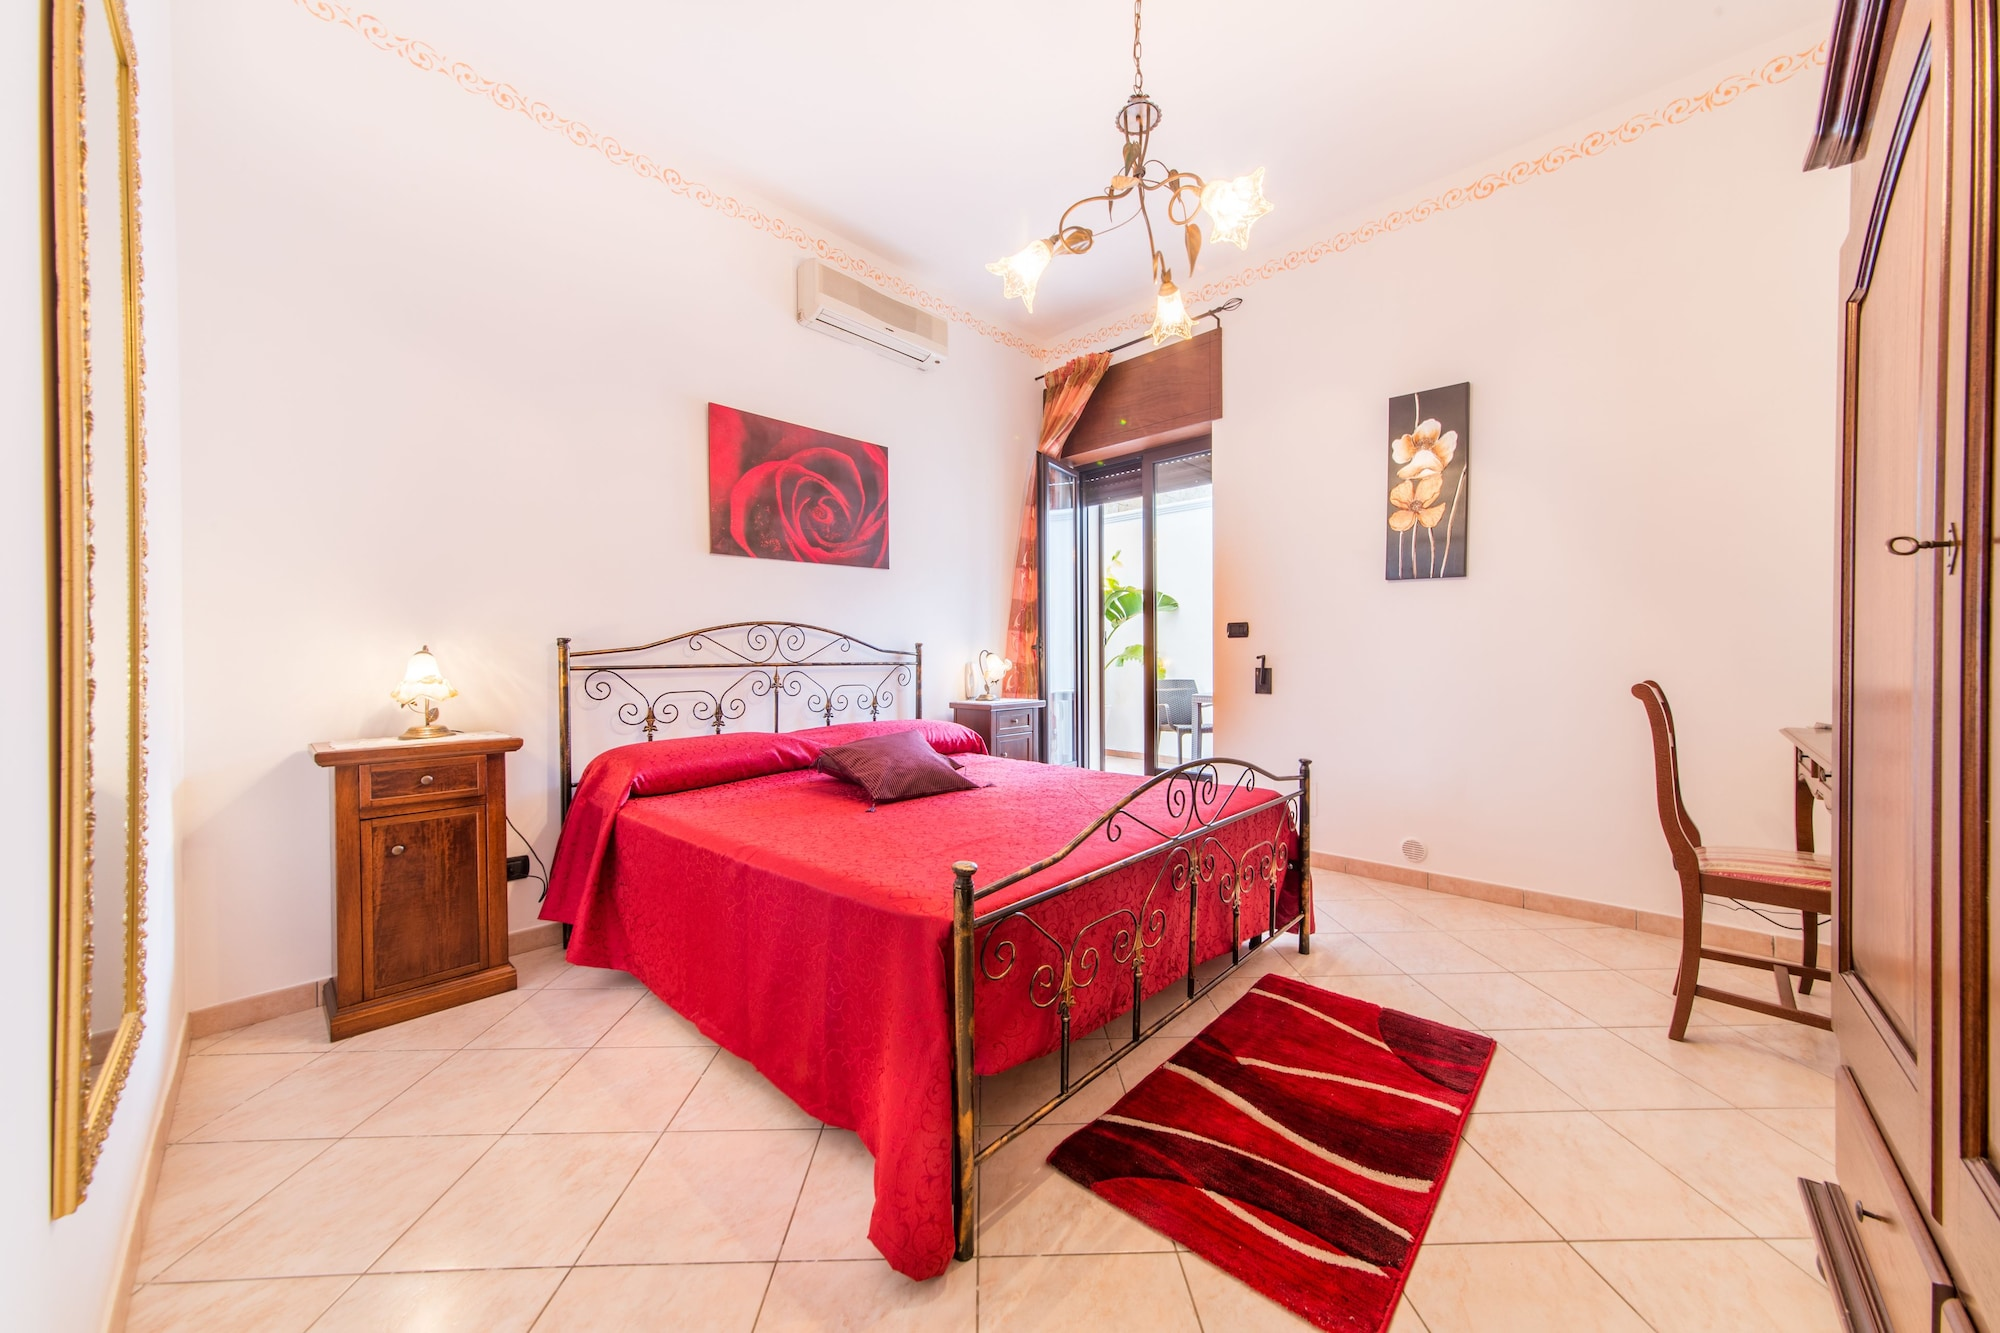 Salento Sweet Home & Mirea, Lecce